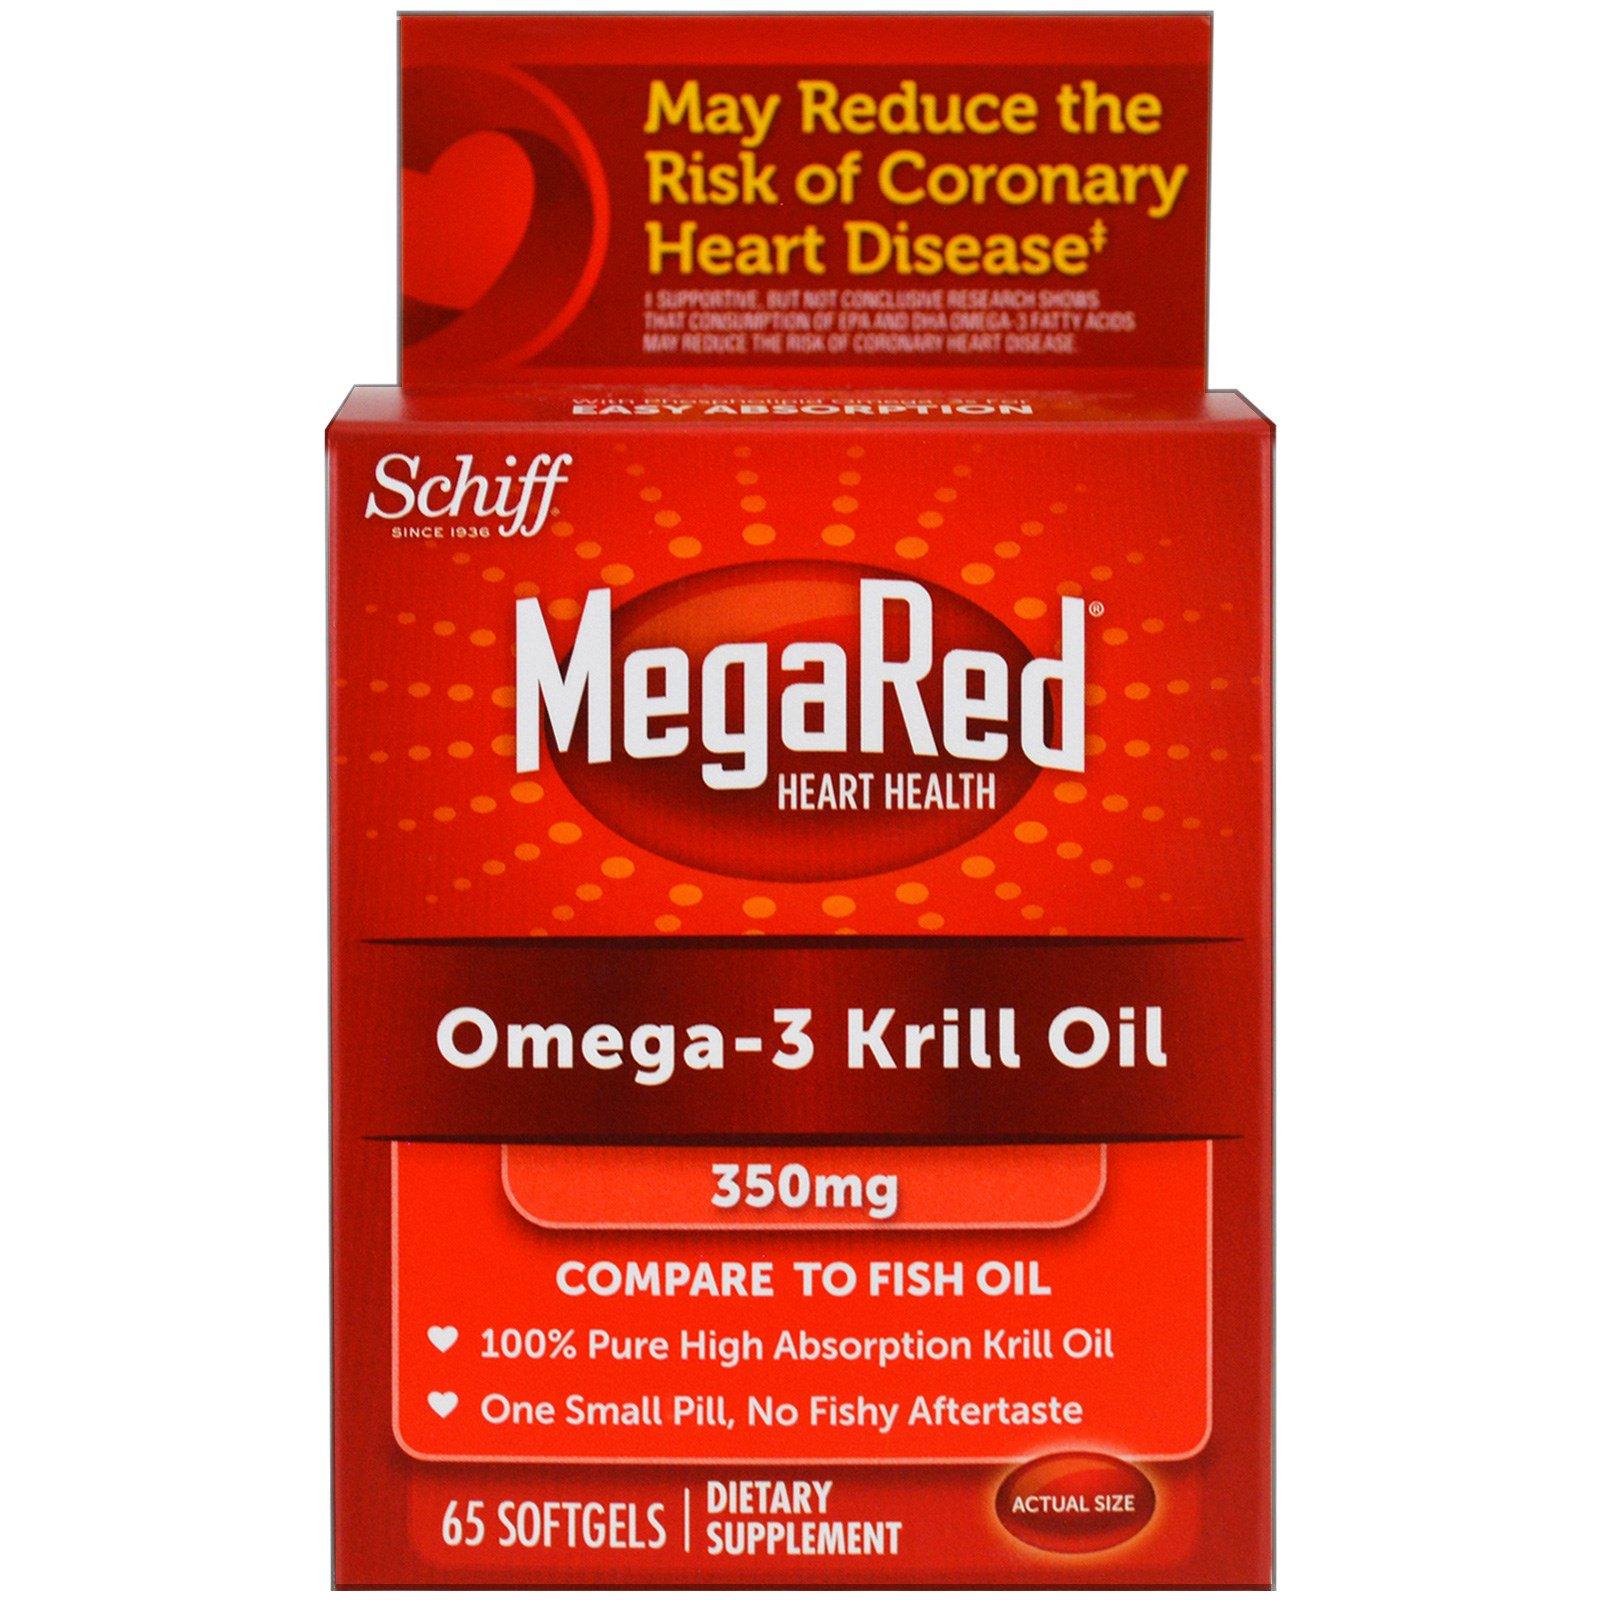 Schiff megared omega 3 krill oil 350 mg 65 softgels for Krill or fish oil